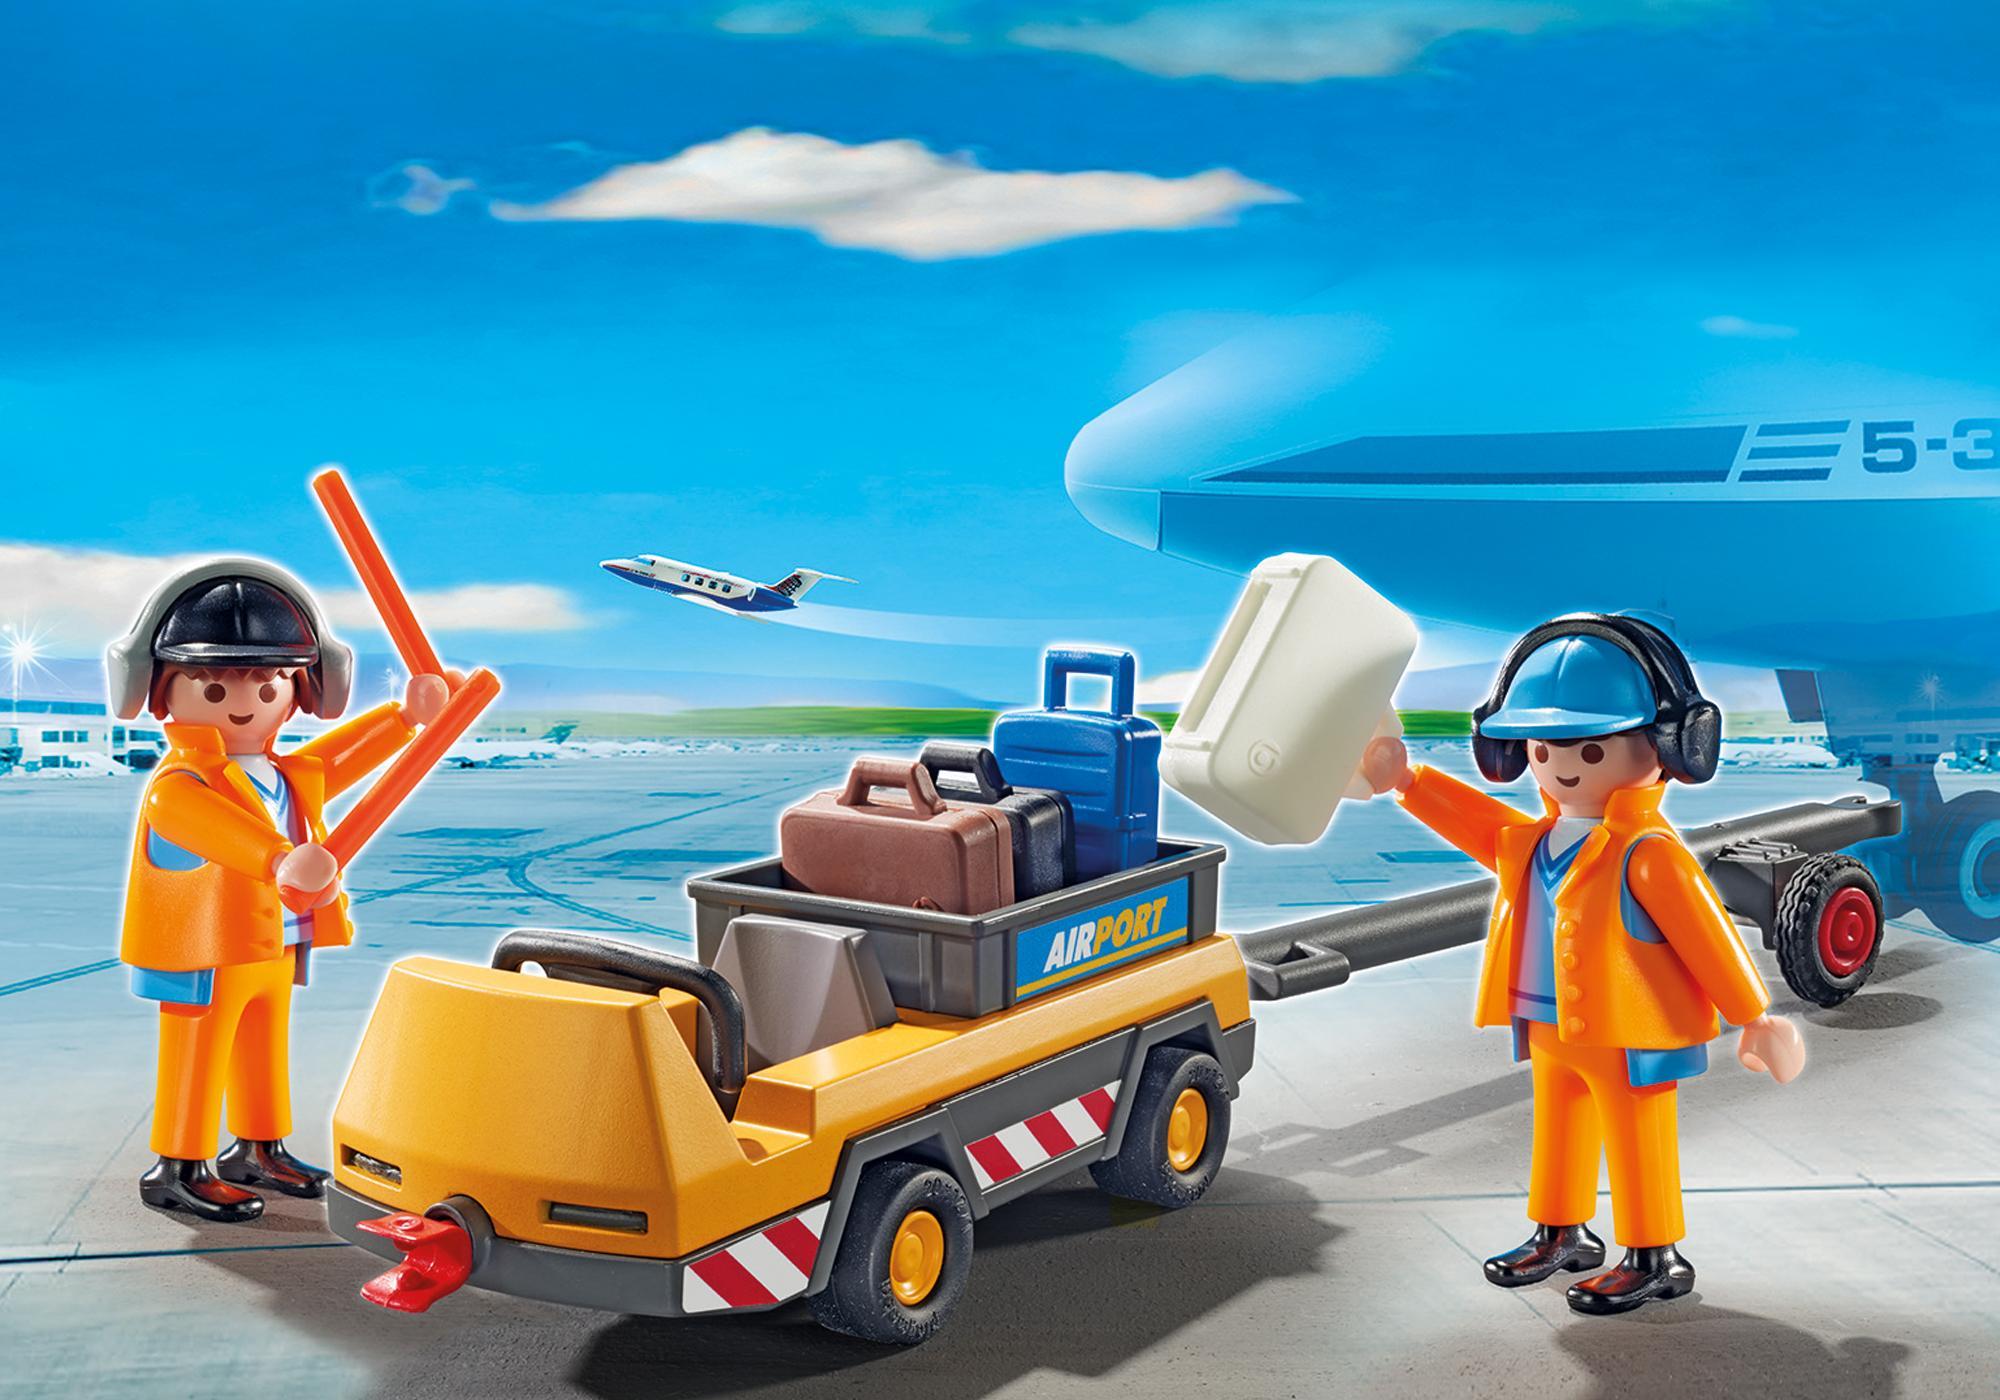 http://media.playmobil.com/i/playmobil/5396_product_detail/Flugzeugschlepper mit Fluglotsen